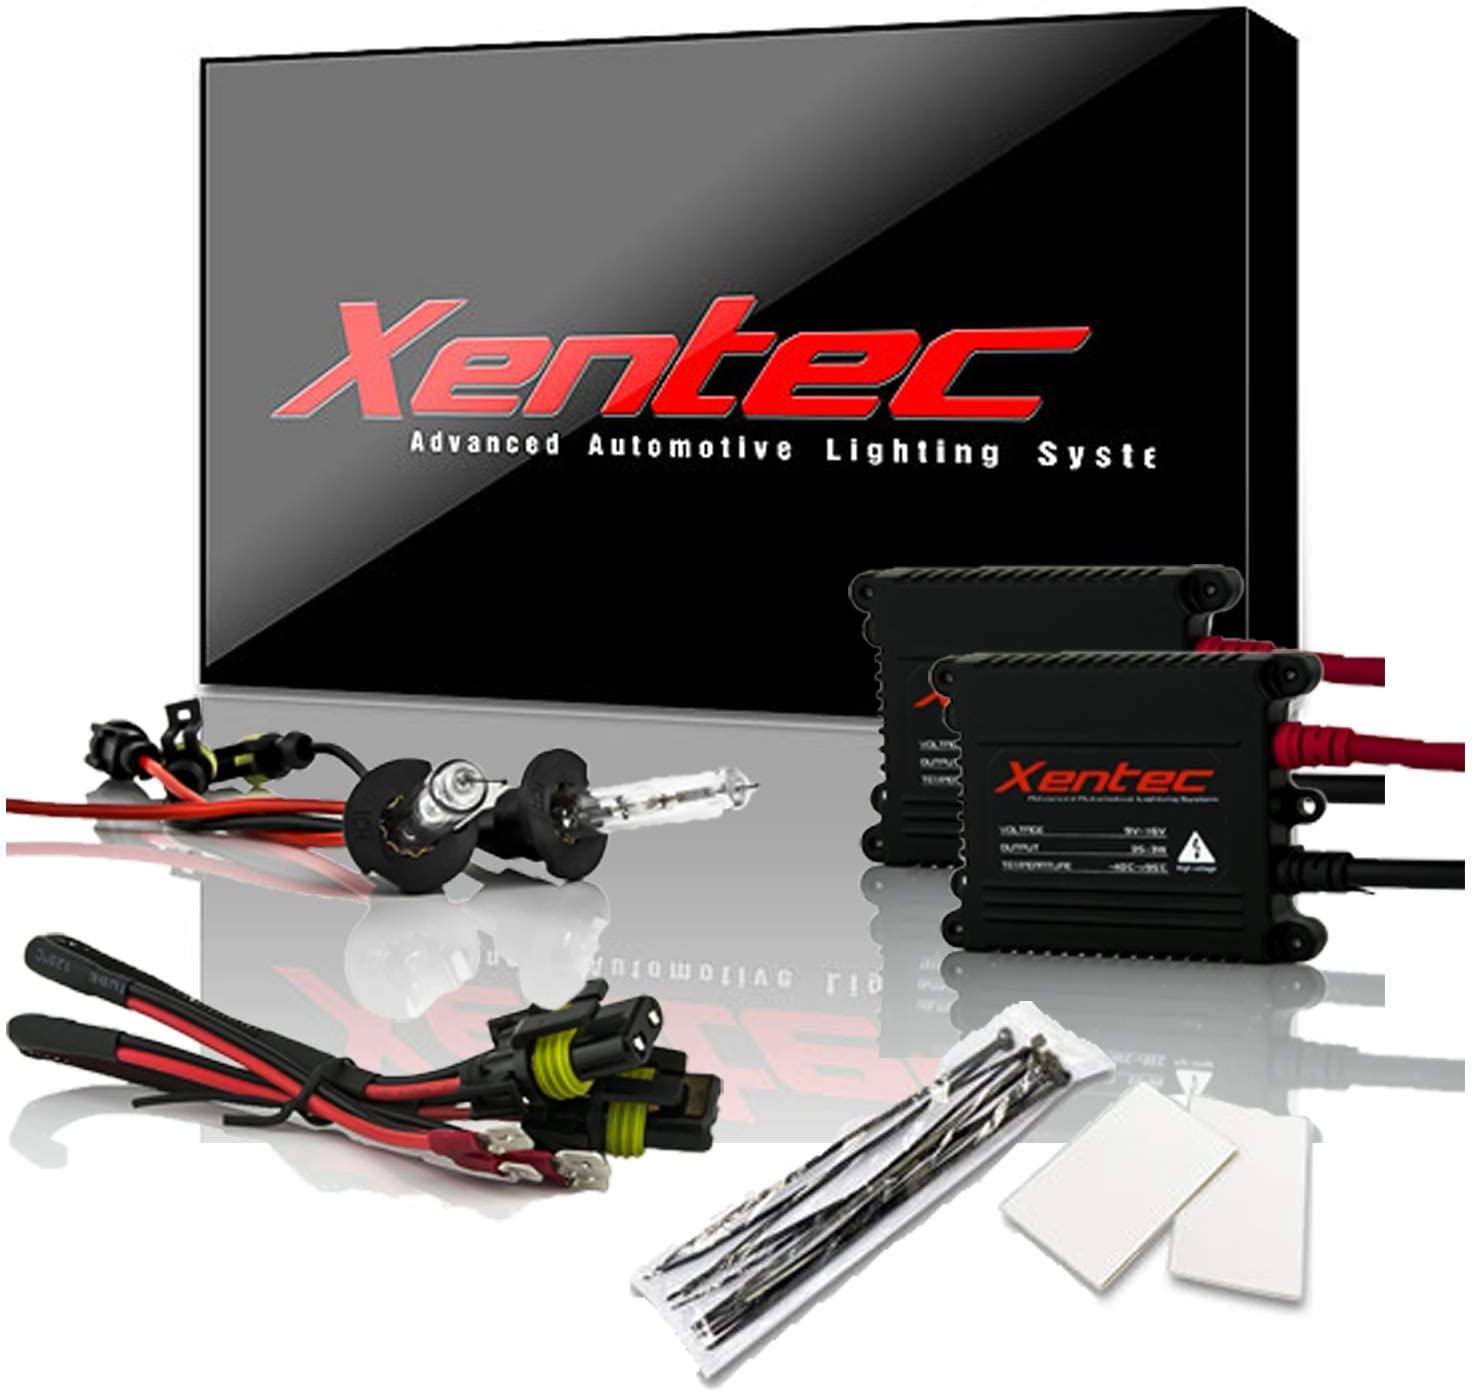 Xentec H3 6000K HID Xenon Bulb bundle with 55W EPE Alloy Slim Ballast (Ultra White)